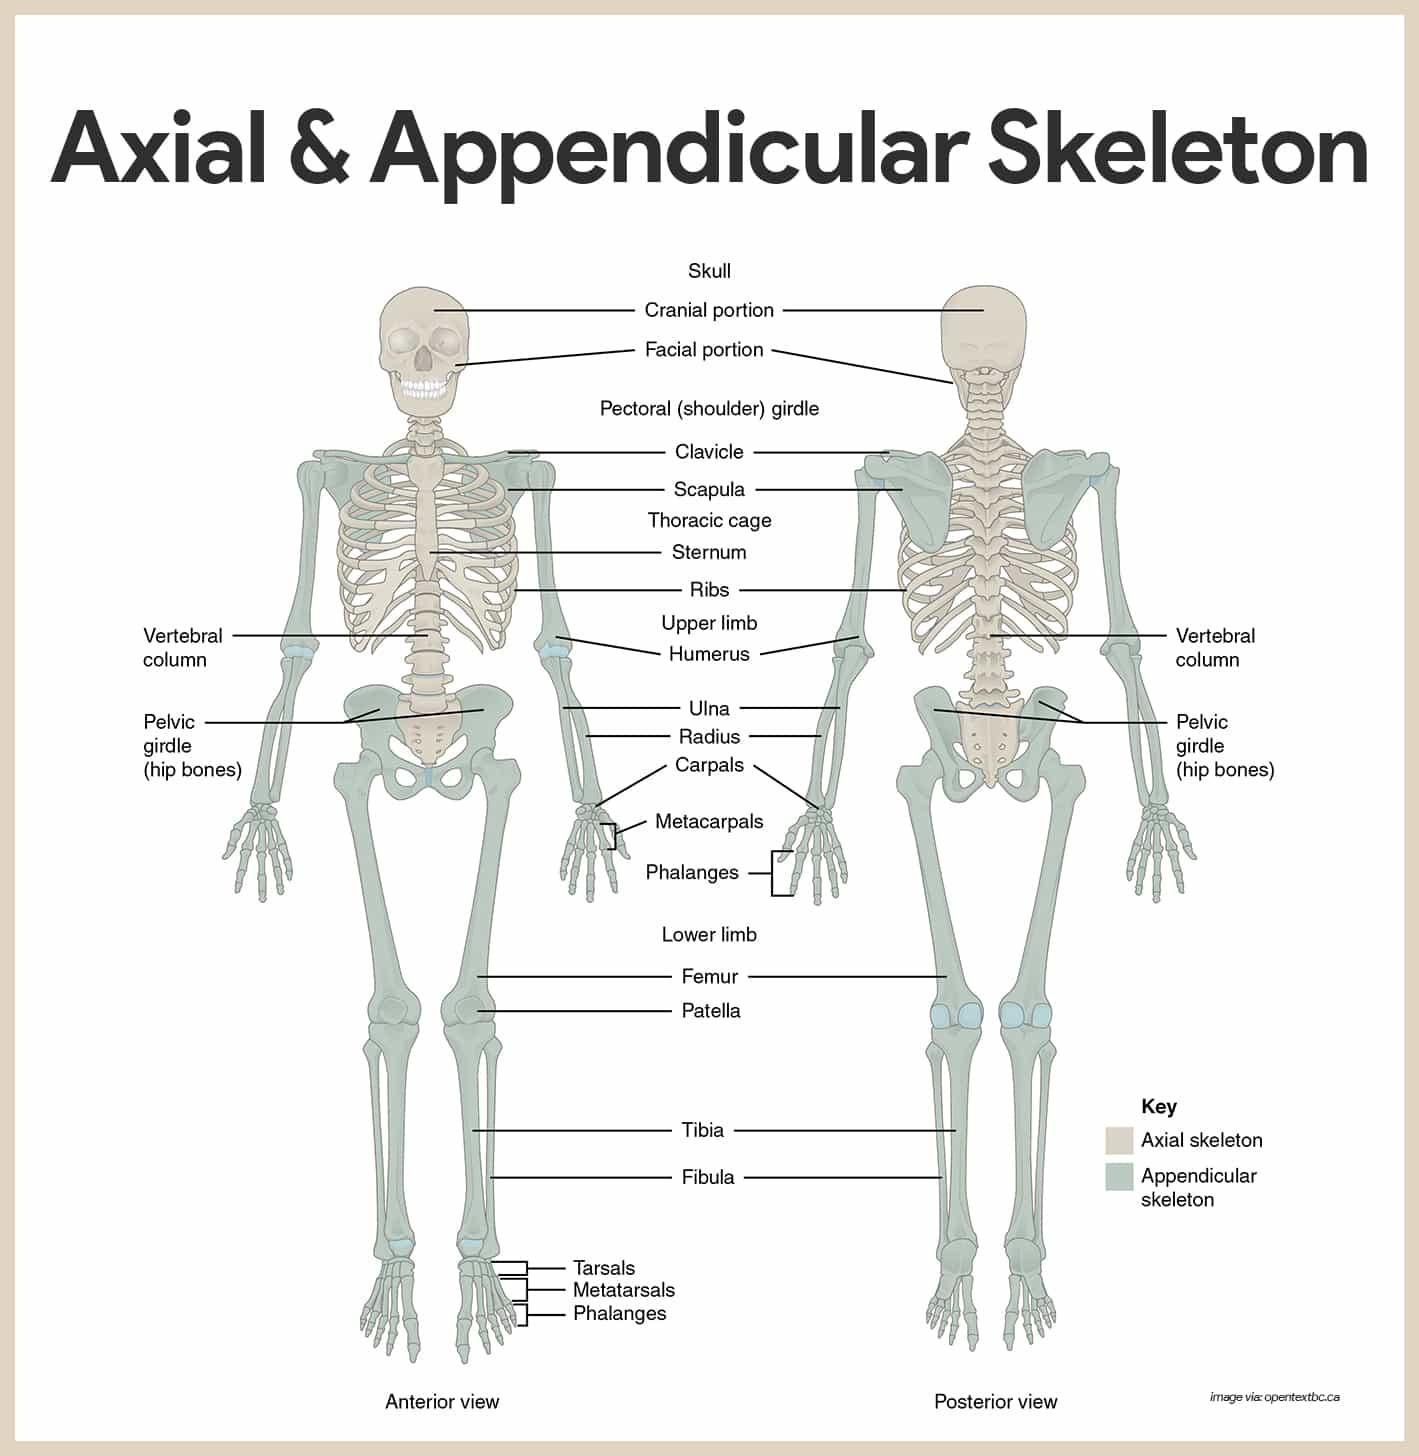 Skeletal System Diagram Skeletal System Anatomy And Physiology Nurseslabs